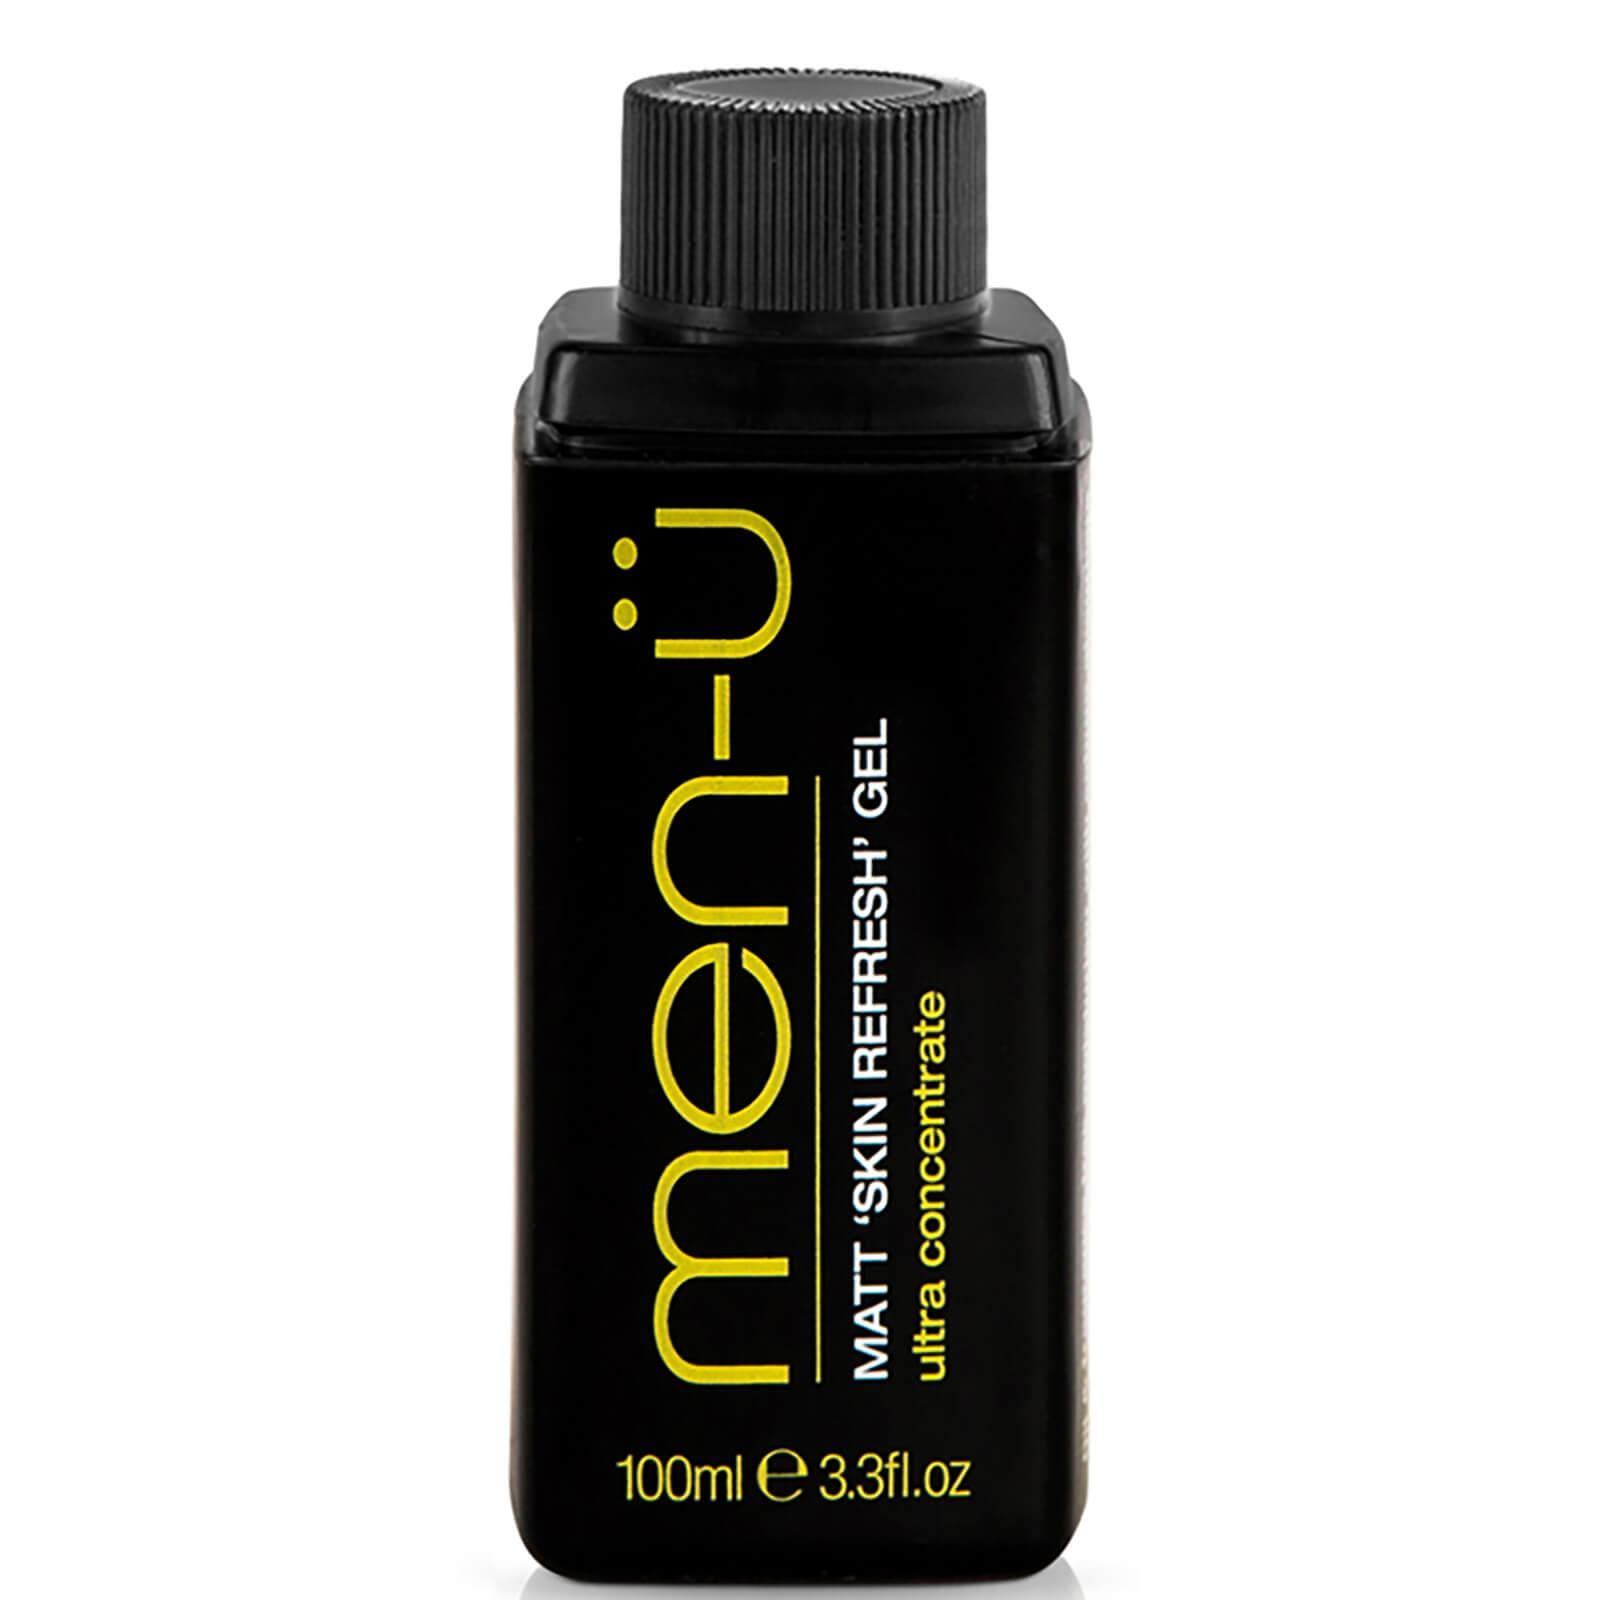 men-ü Matt Skin Refresh Gel 100ml - Refill